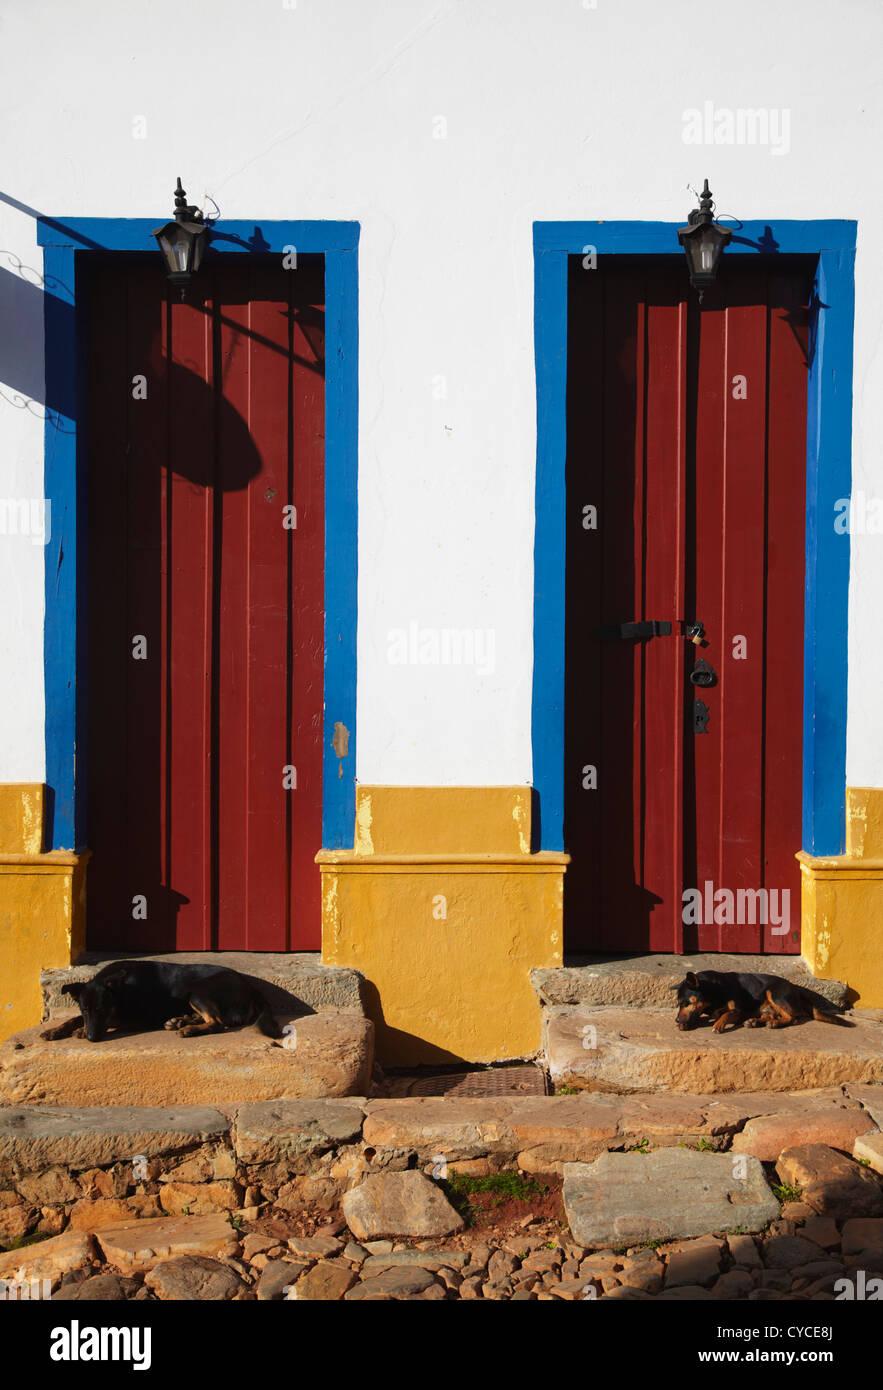 Dogs sleeping on steps of colourful doors of colonial building, Tiradentes, Minas Gerais, Brazil - Stock Image